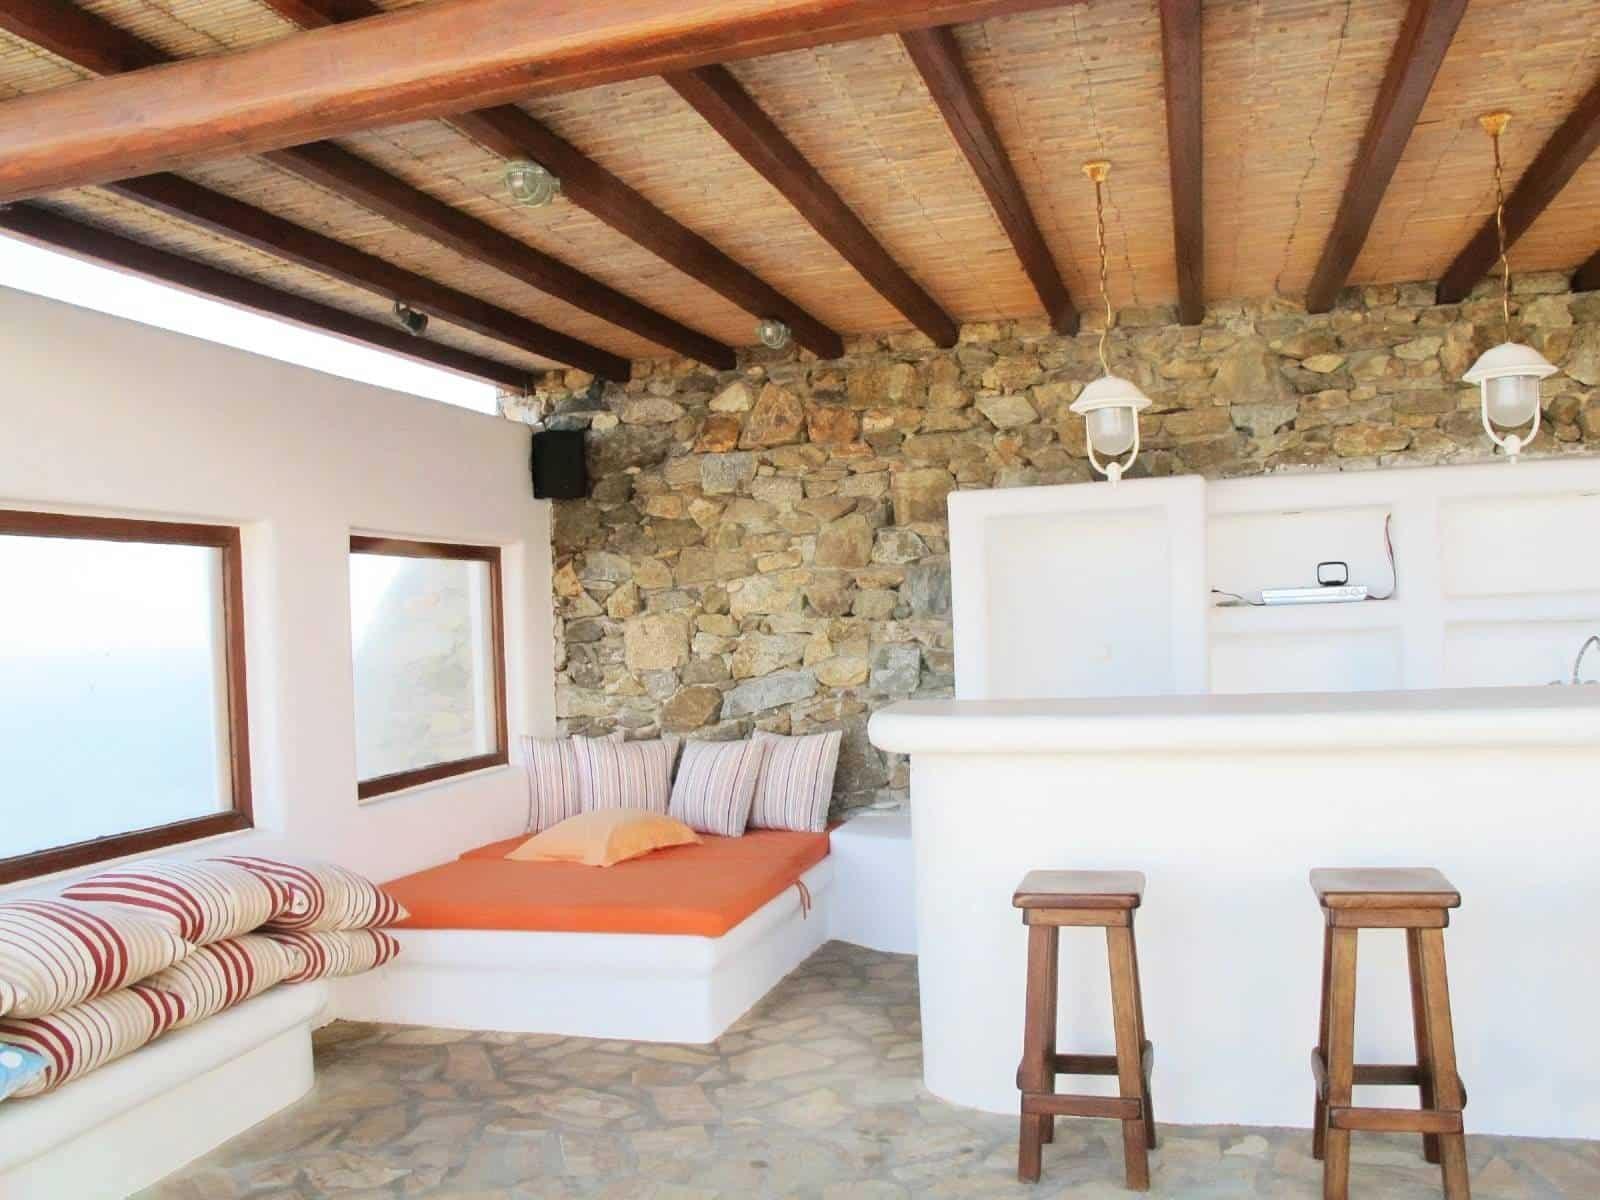 luxurious villa Mykonos - πολυτελής βίλα Μύκονος - mykonos services - οικοδομικές εργασίες 10